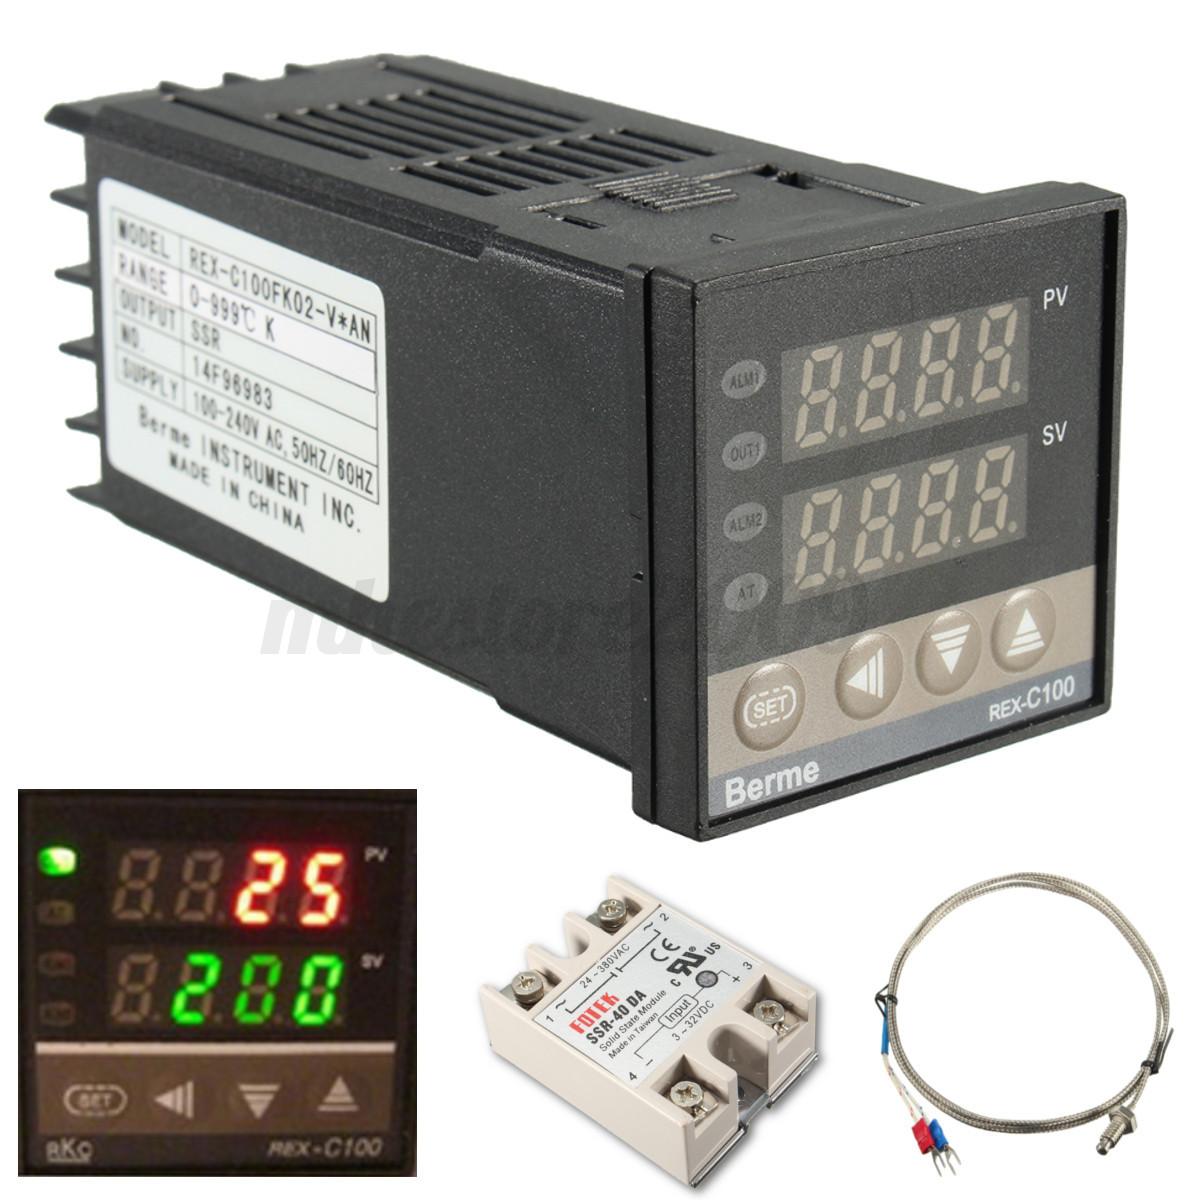 220V AC PID REX C100 Temperature Controller Max 40A SSR K Thermocouple #28B516